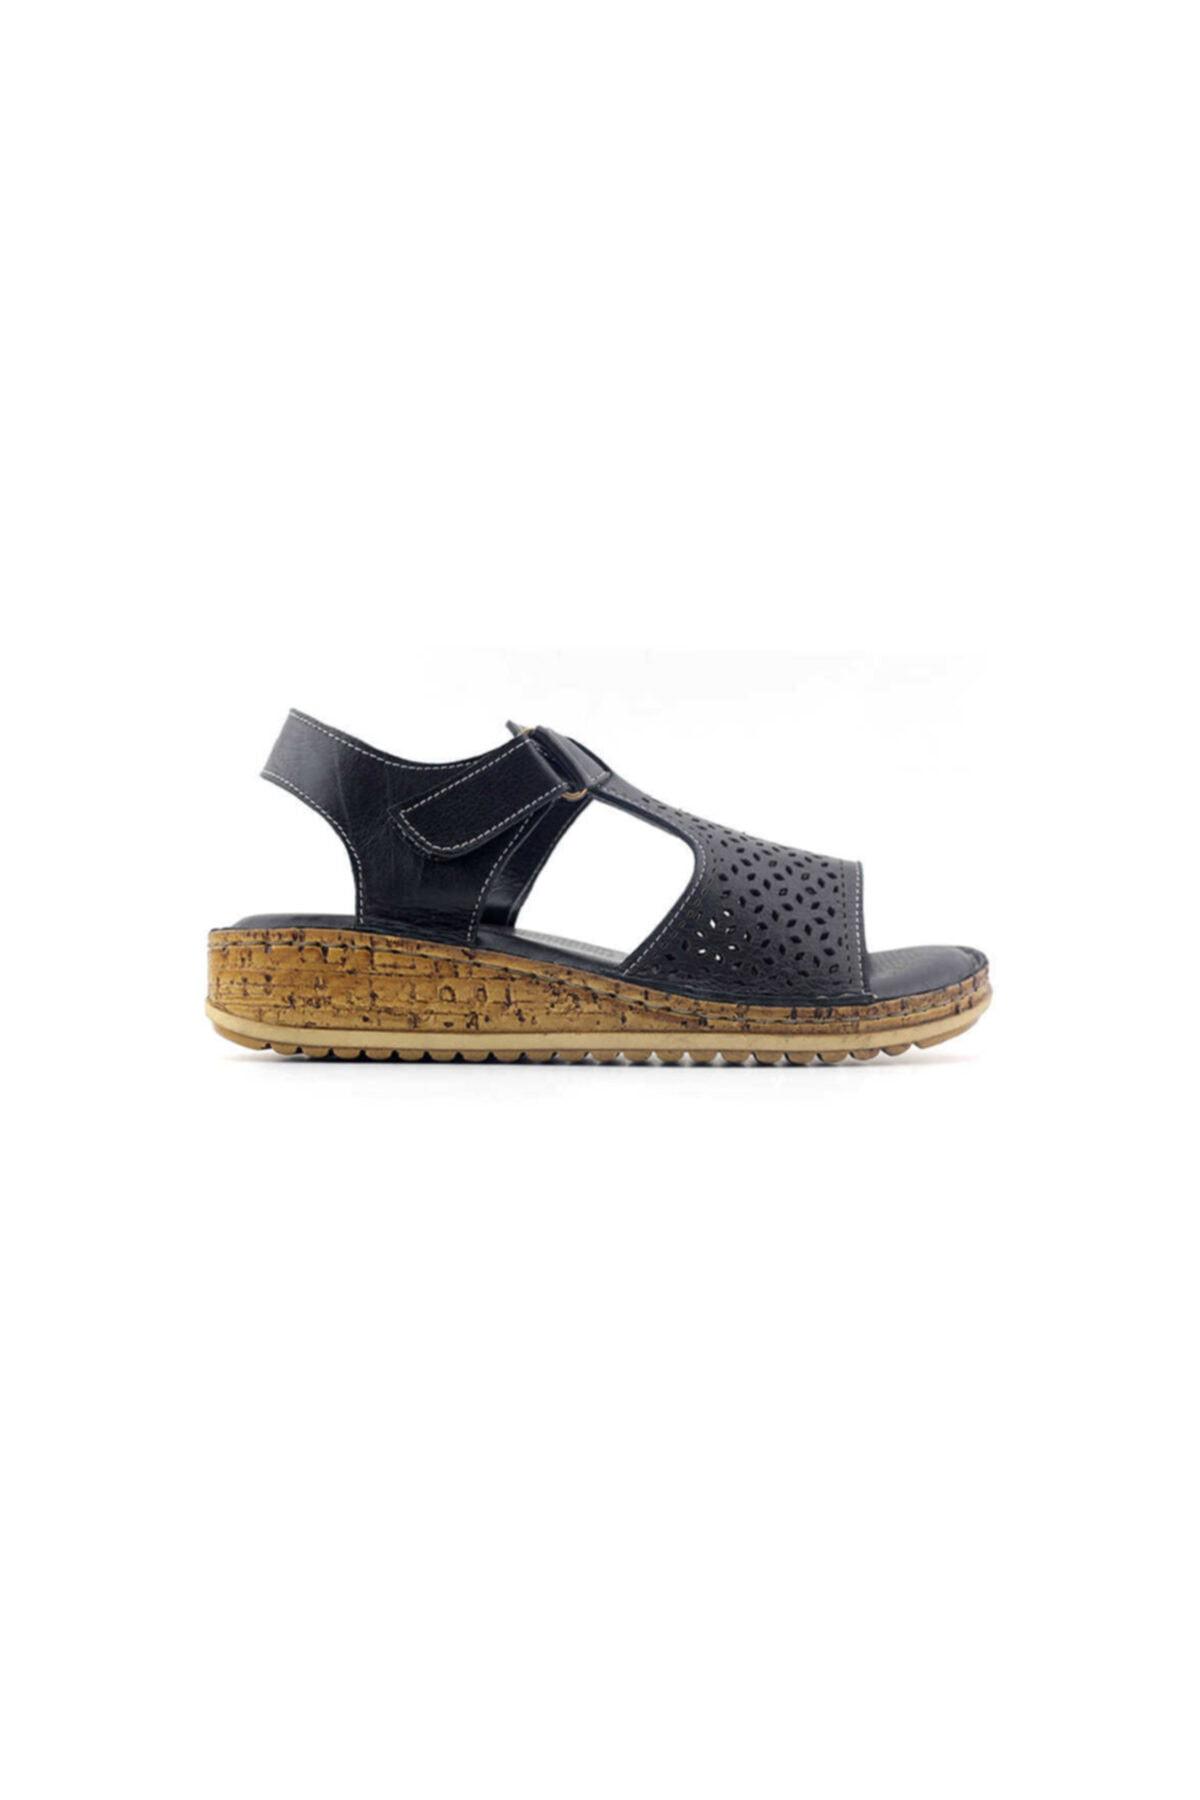 Kayra 910 Hakiki Deri Kadın Sandalet-siyah 1